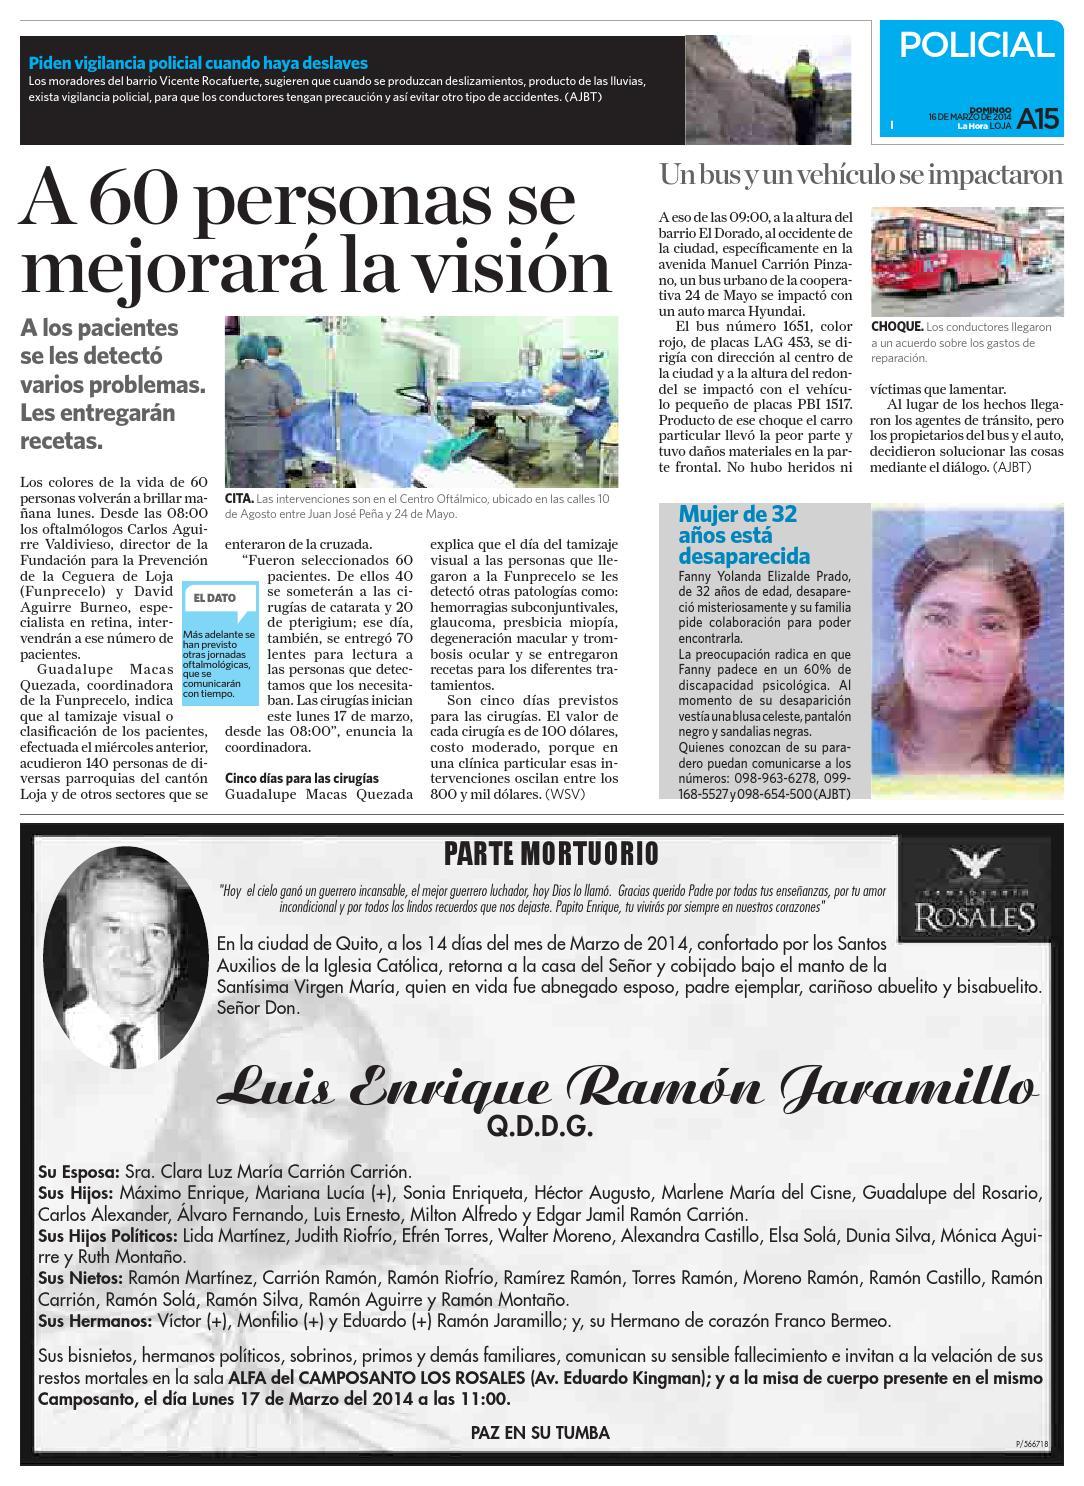 By De Marzo Diario Ecuador 2014 La Issuu 16 Hora Loja c4Lq35RAj